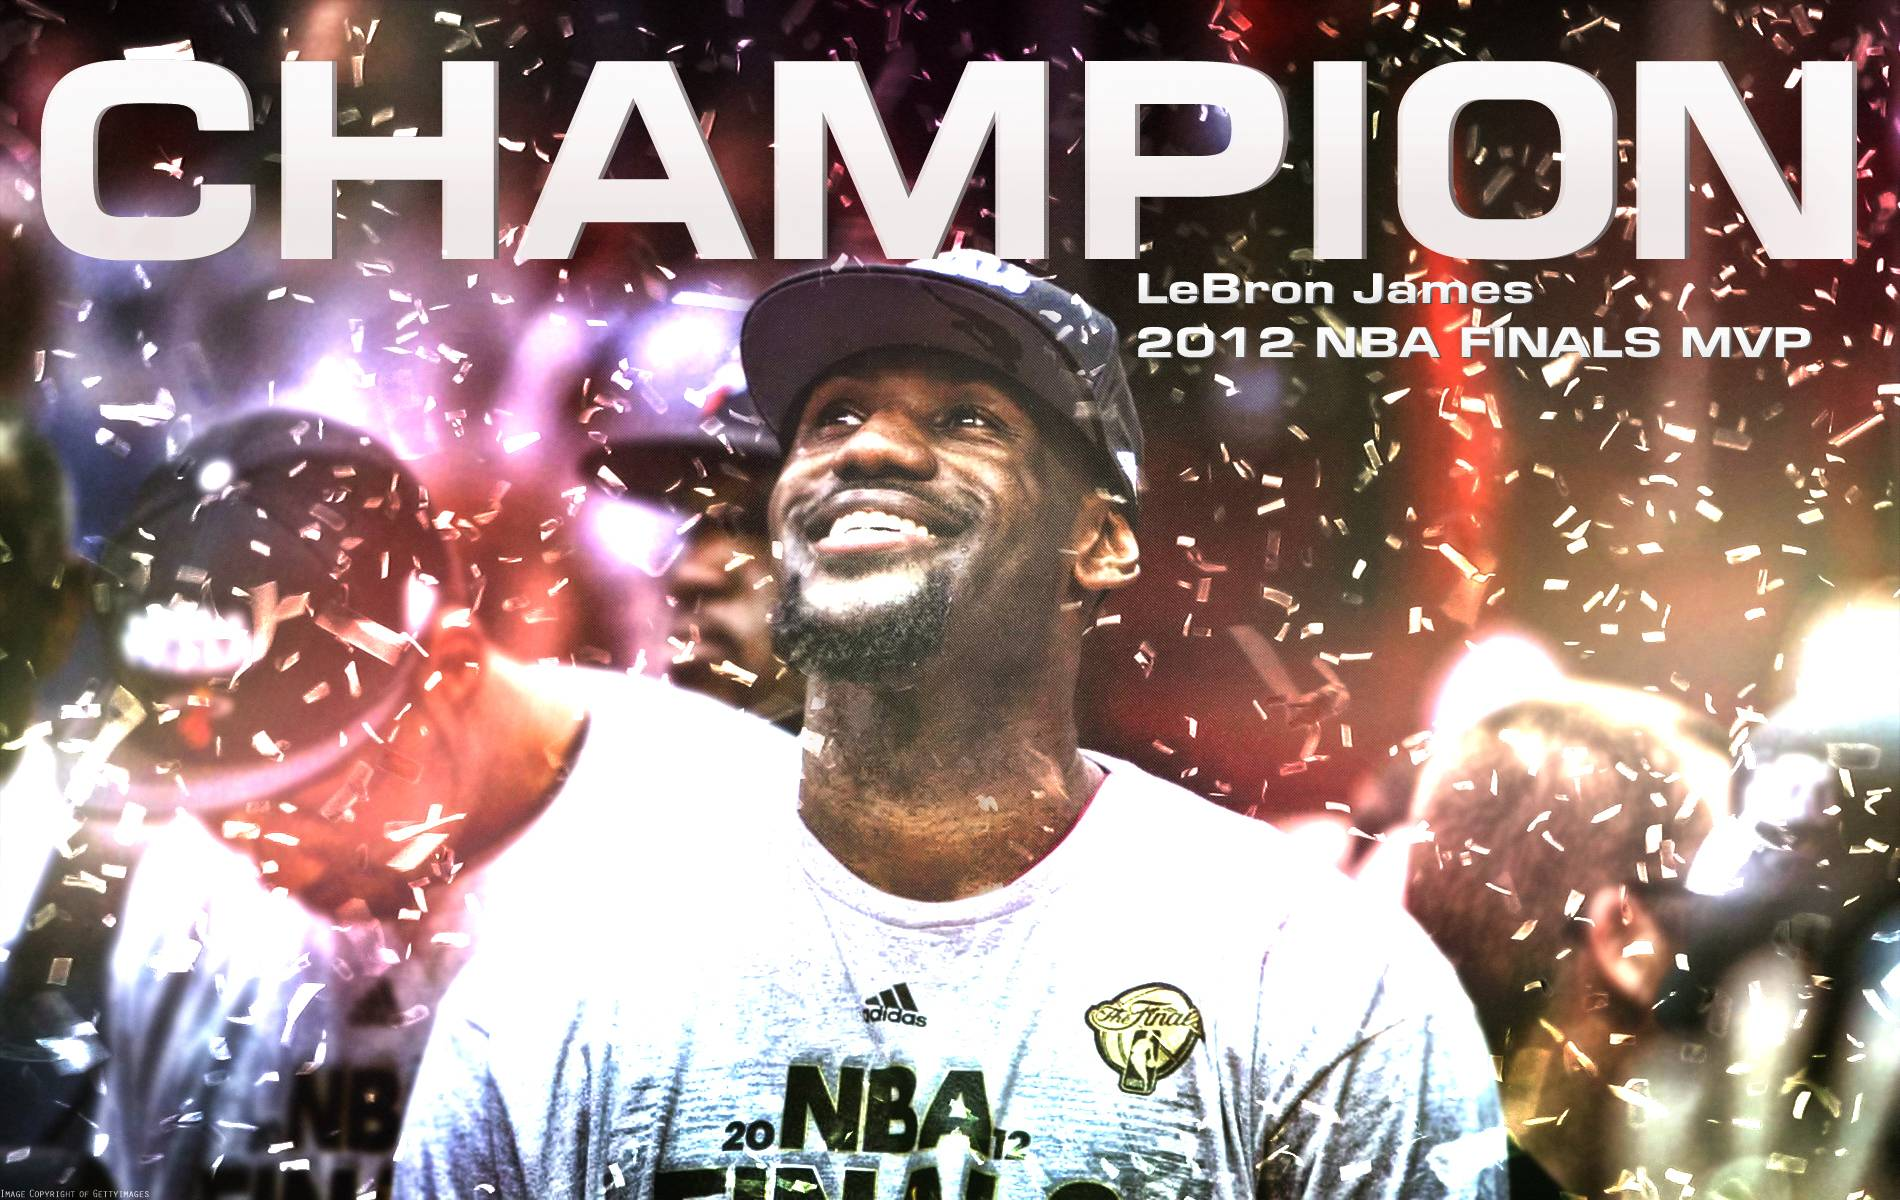 LeBron James NBA Champion Wallpaper by IshaanMishra on DeviantArt